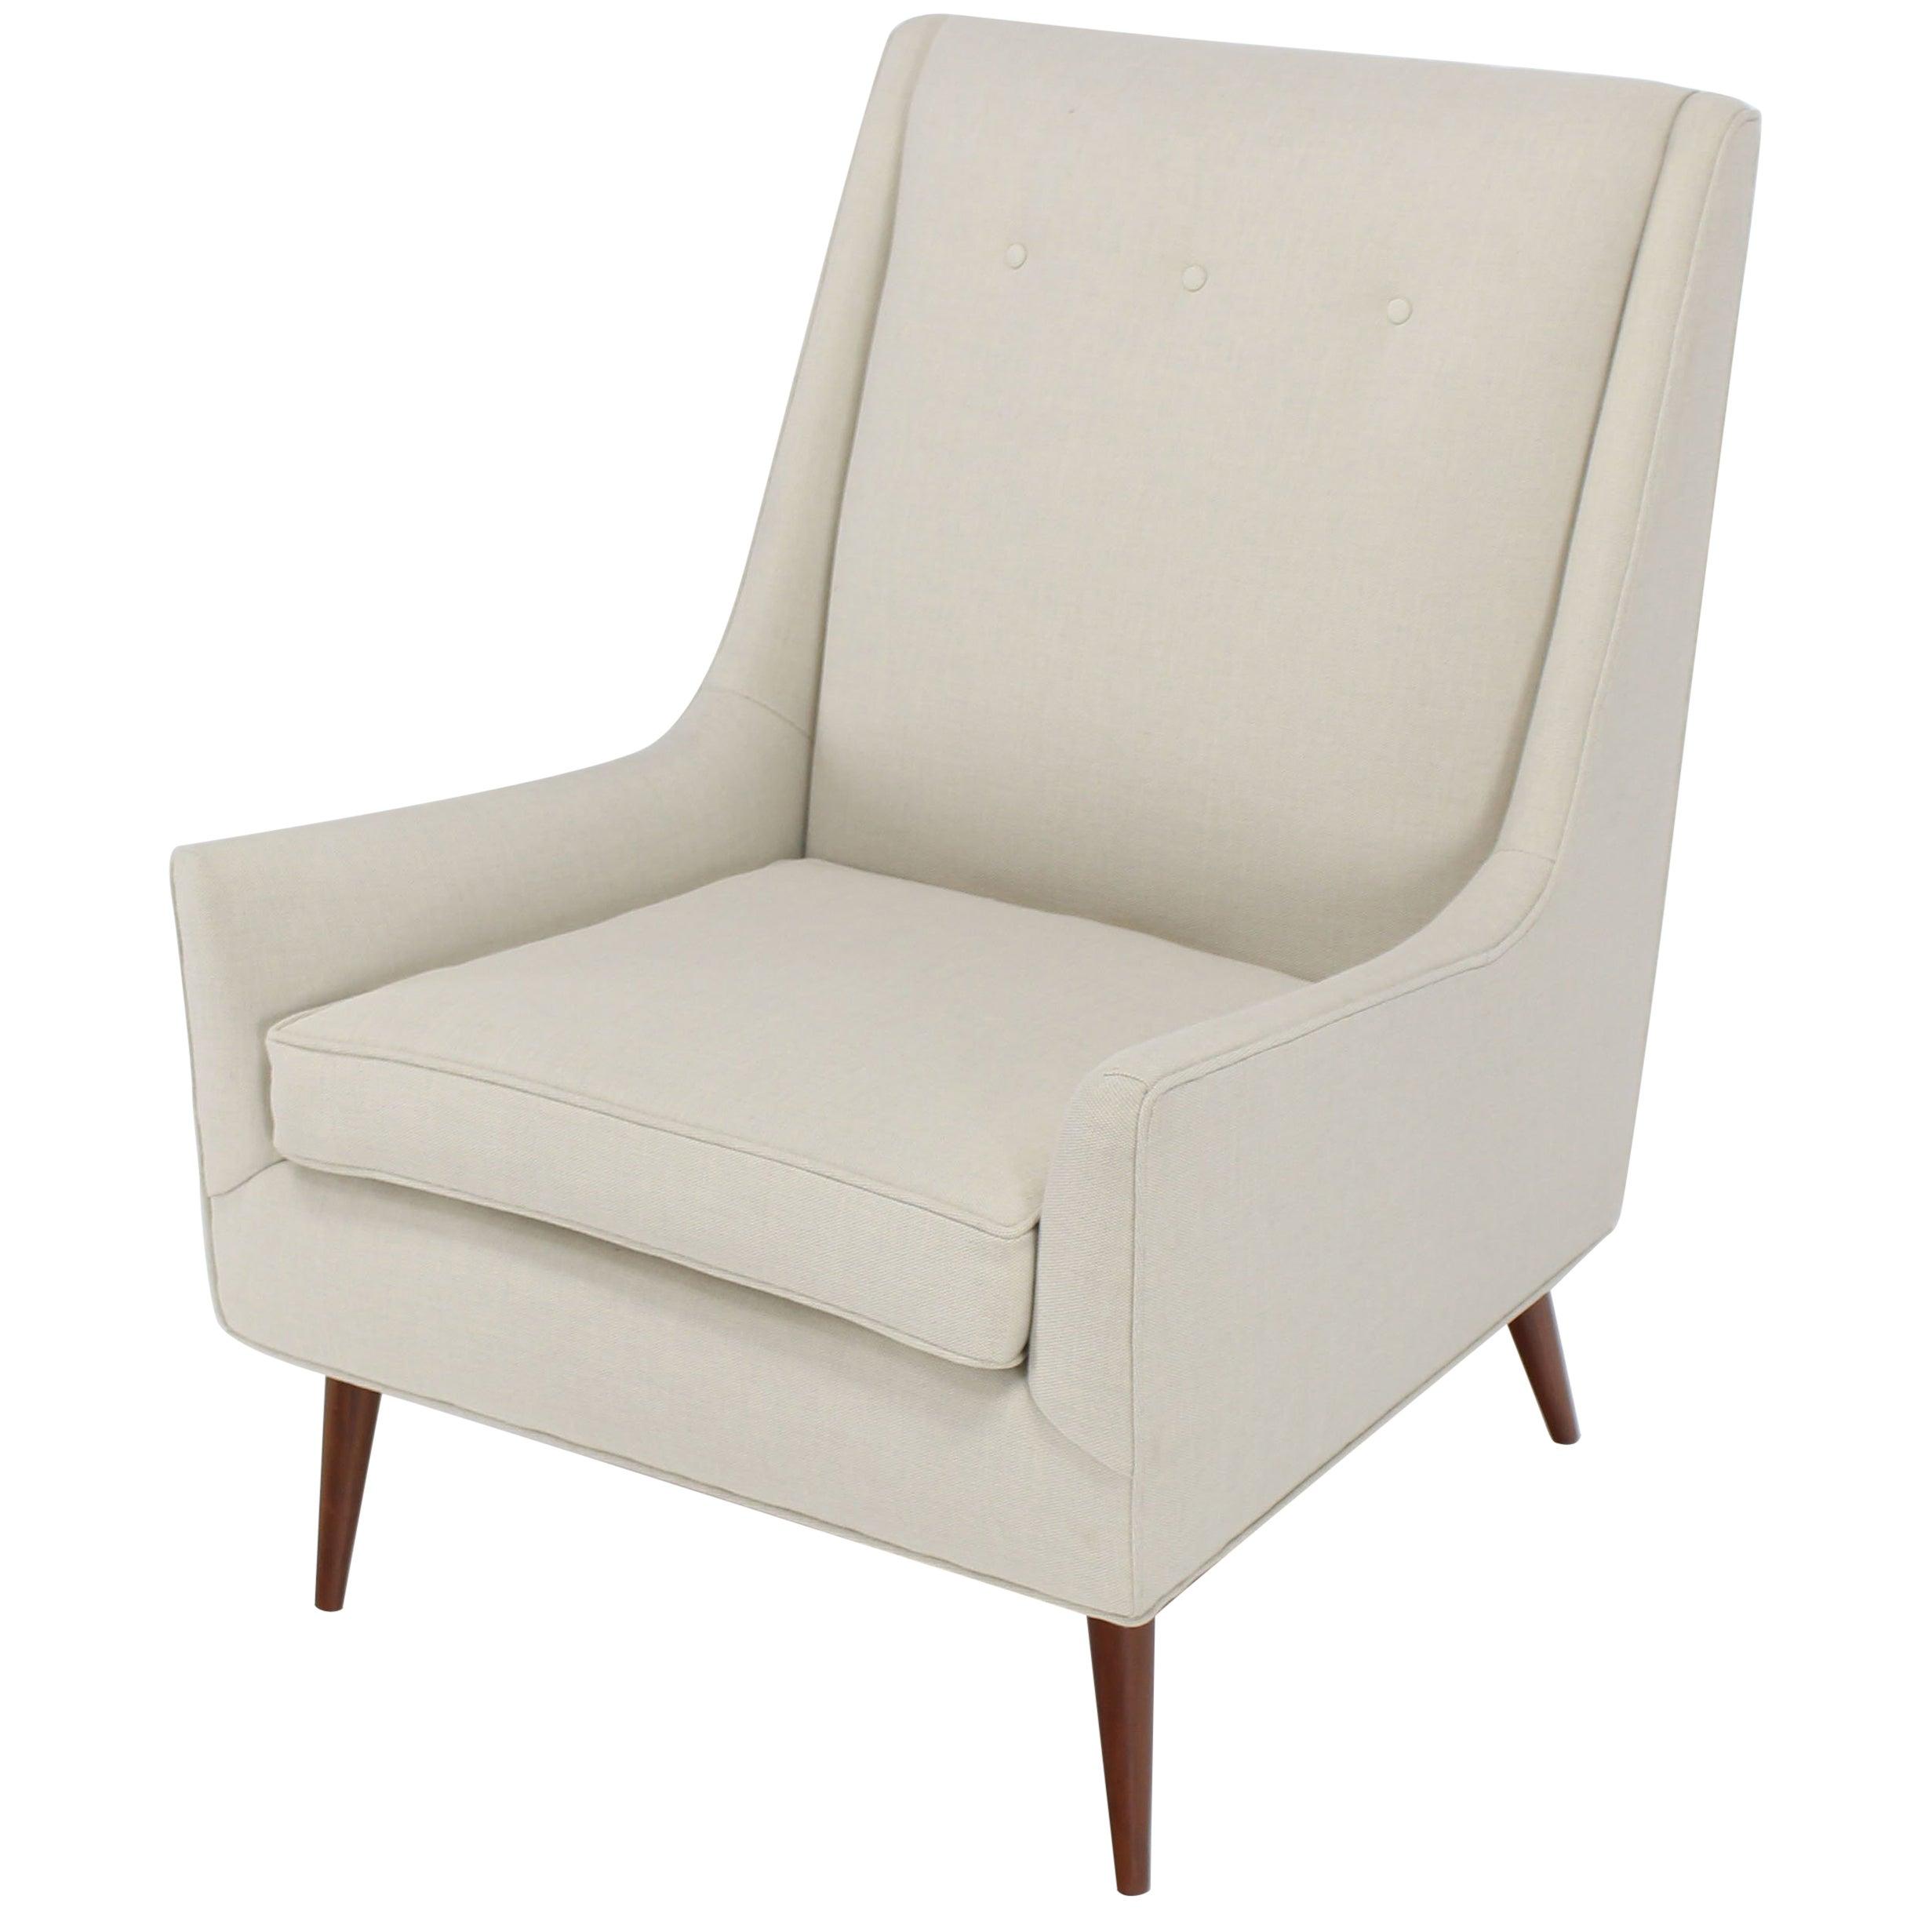 New Upholstery High Dowel Legs McCobb Lounge Chair